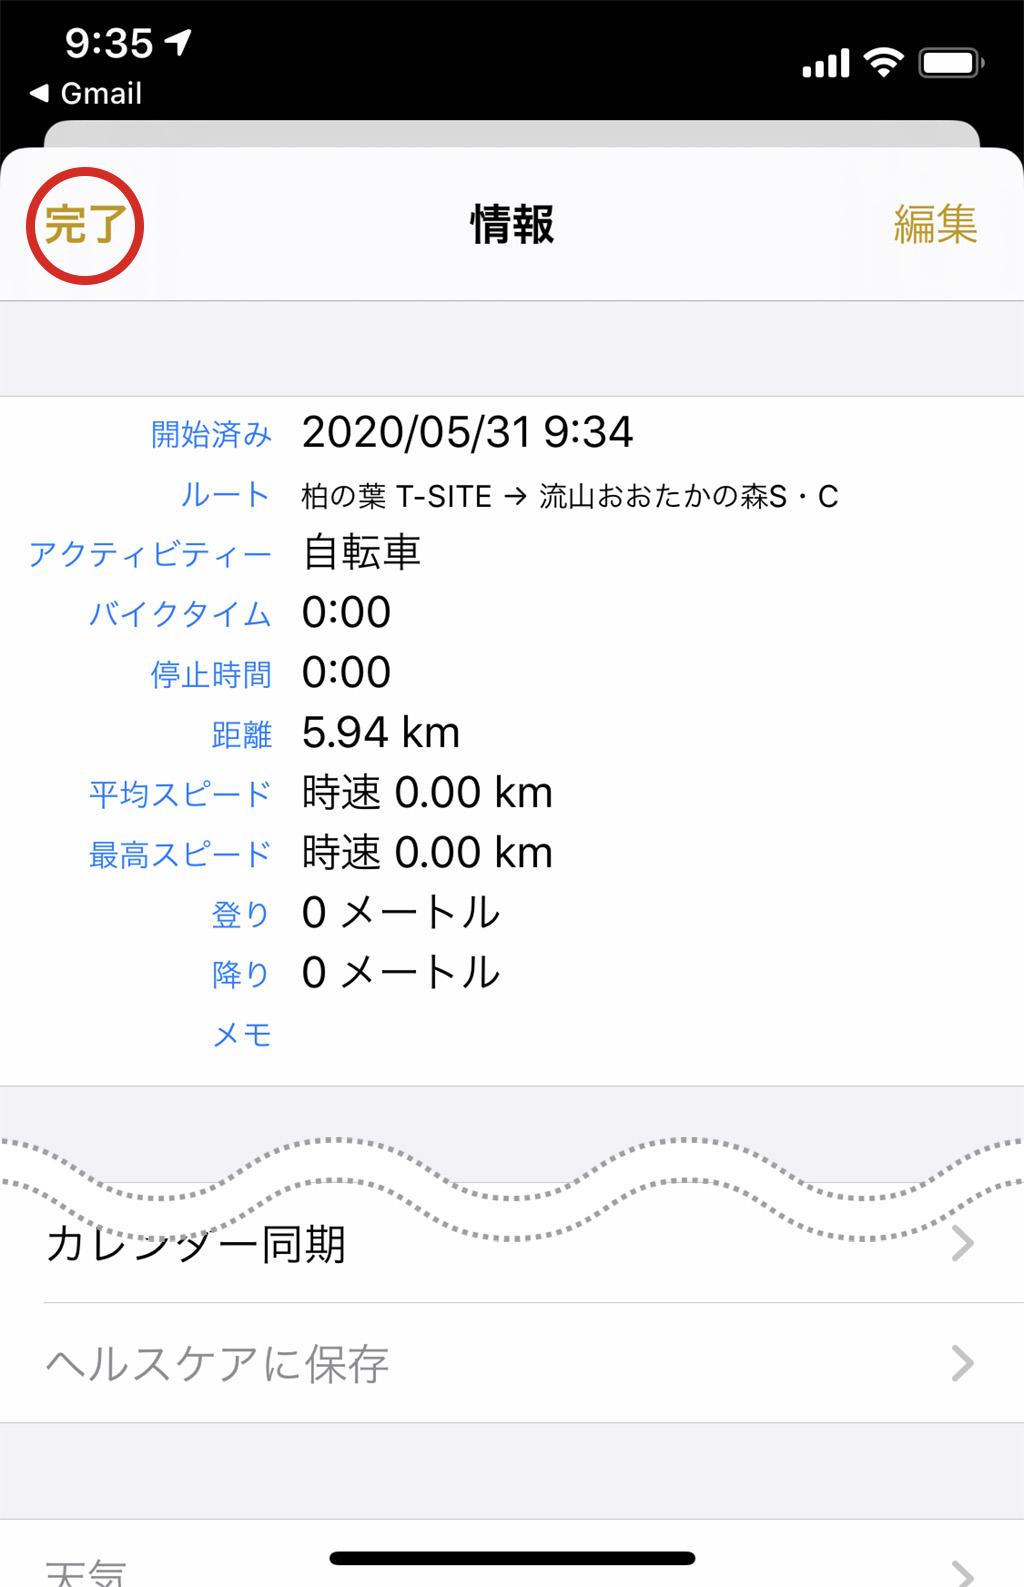 TX沿線ポタリング:GoogleマイマップとCyclemeterで自転車ナビ